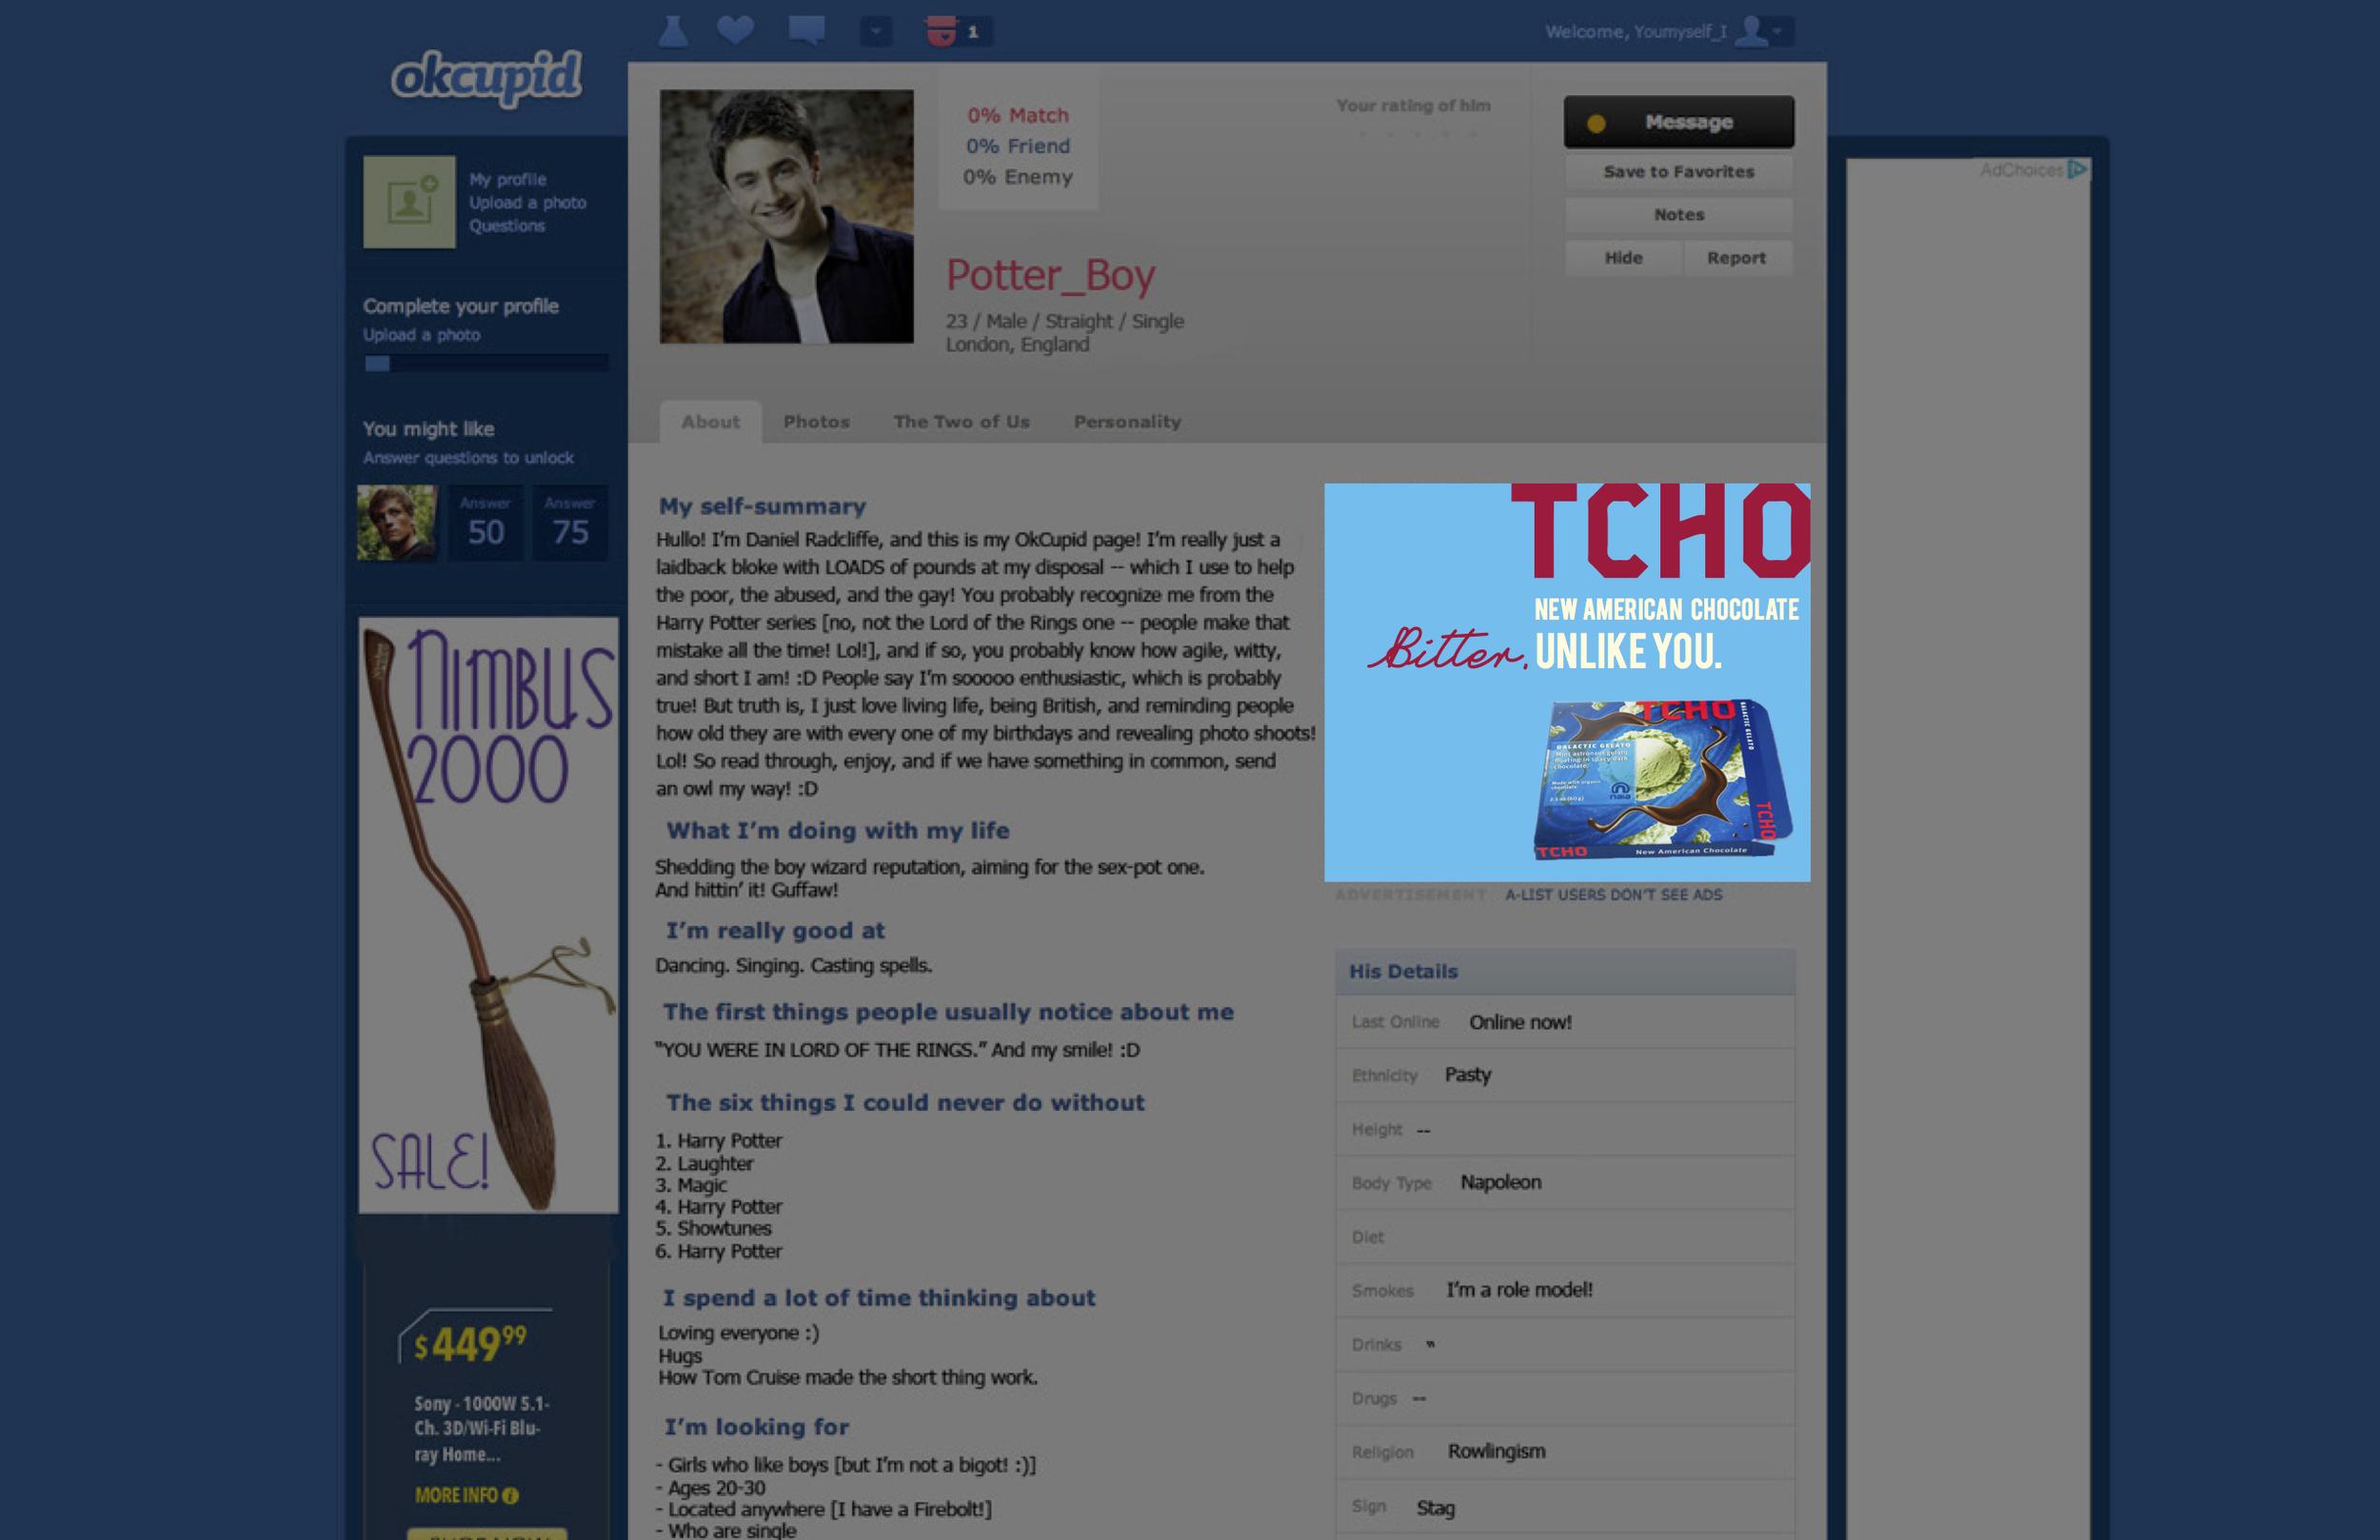 OkCupid-BannerAd-3.4jpg.jpg